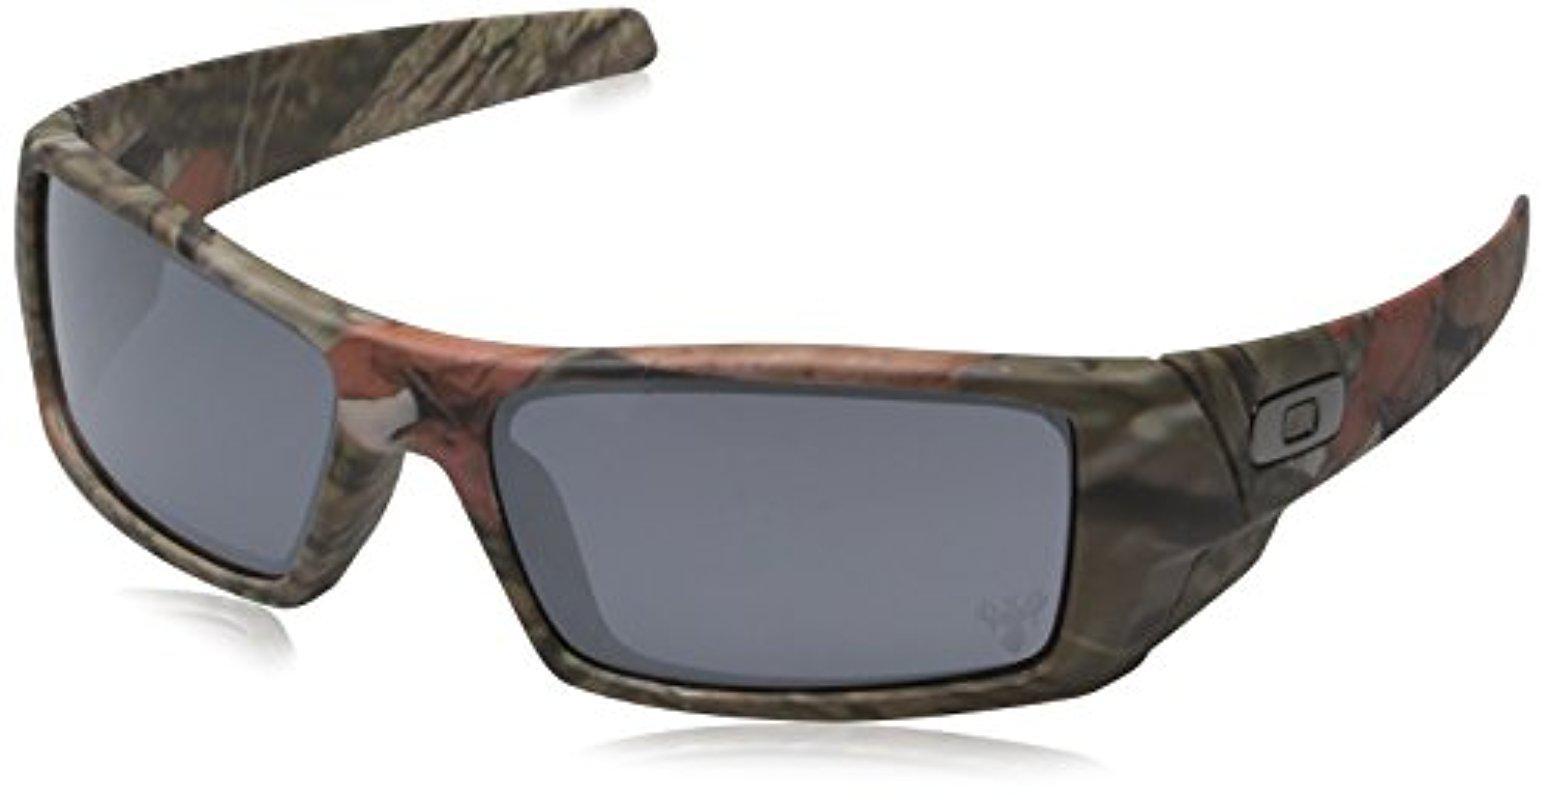 0ff3c996c0a ... closeout lyst oakley oo9014 gascan sunglasses for men 99b36 34232